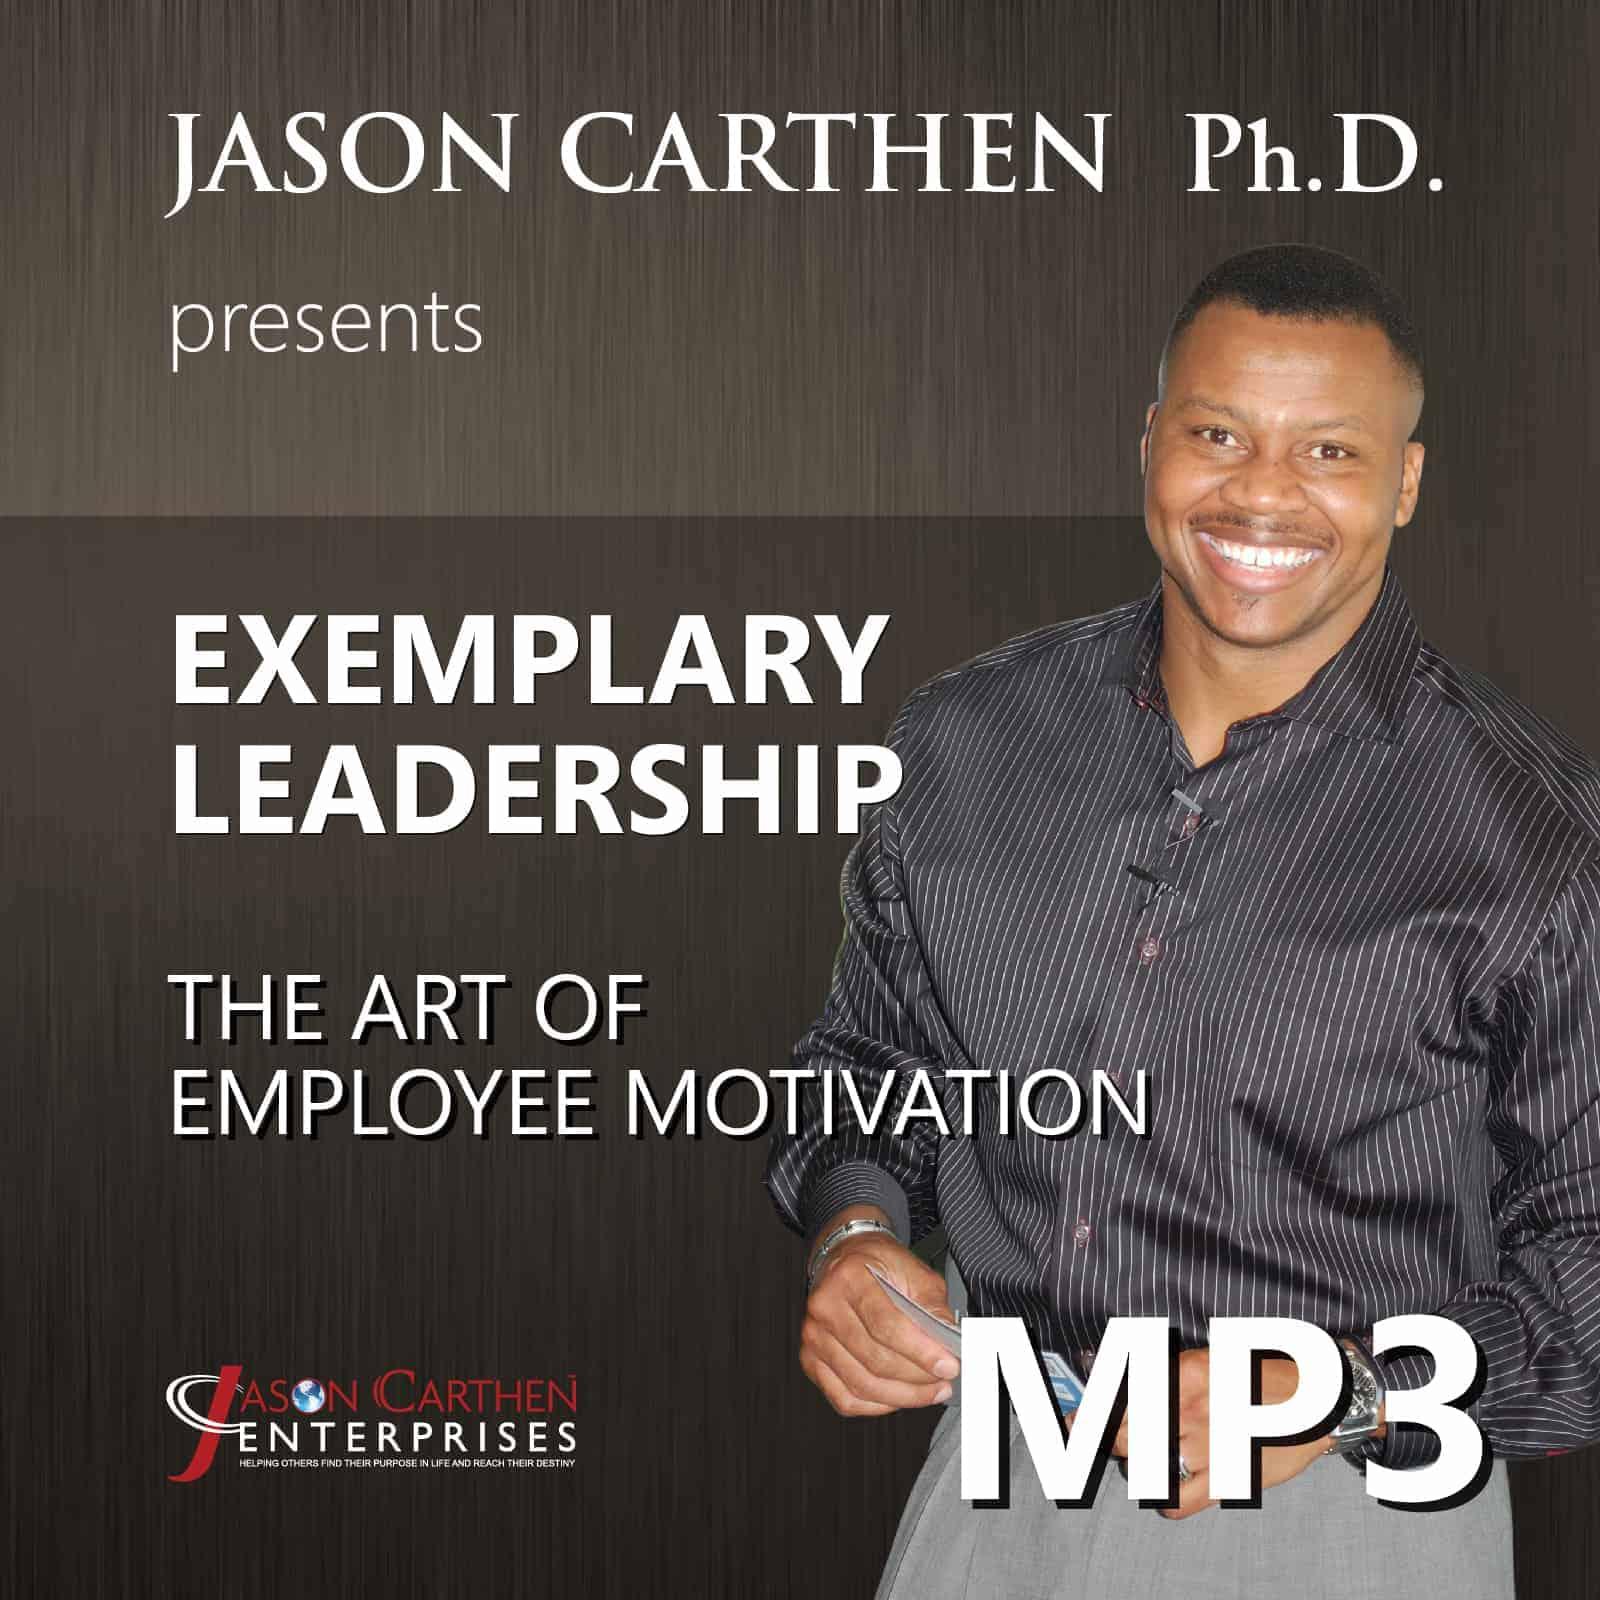 Dr Jason Carthen and the Art of Employee Motivation